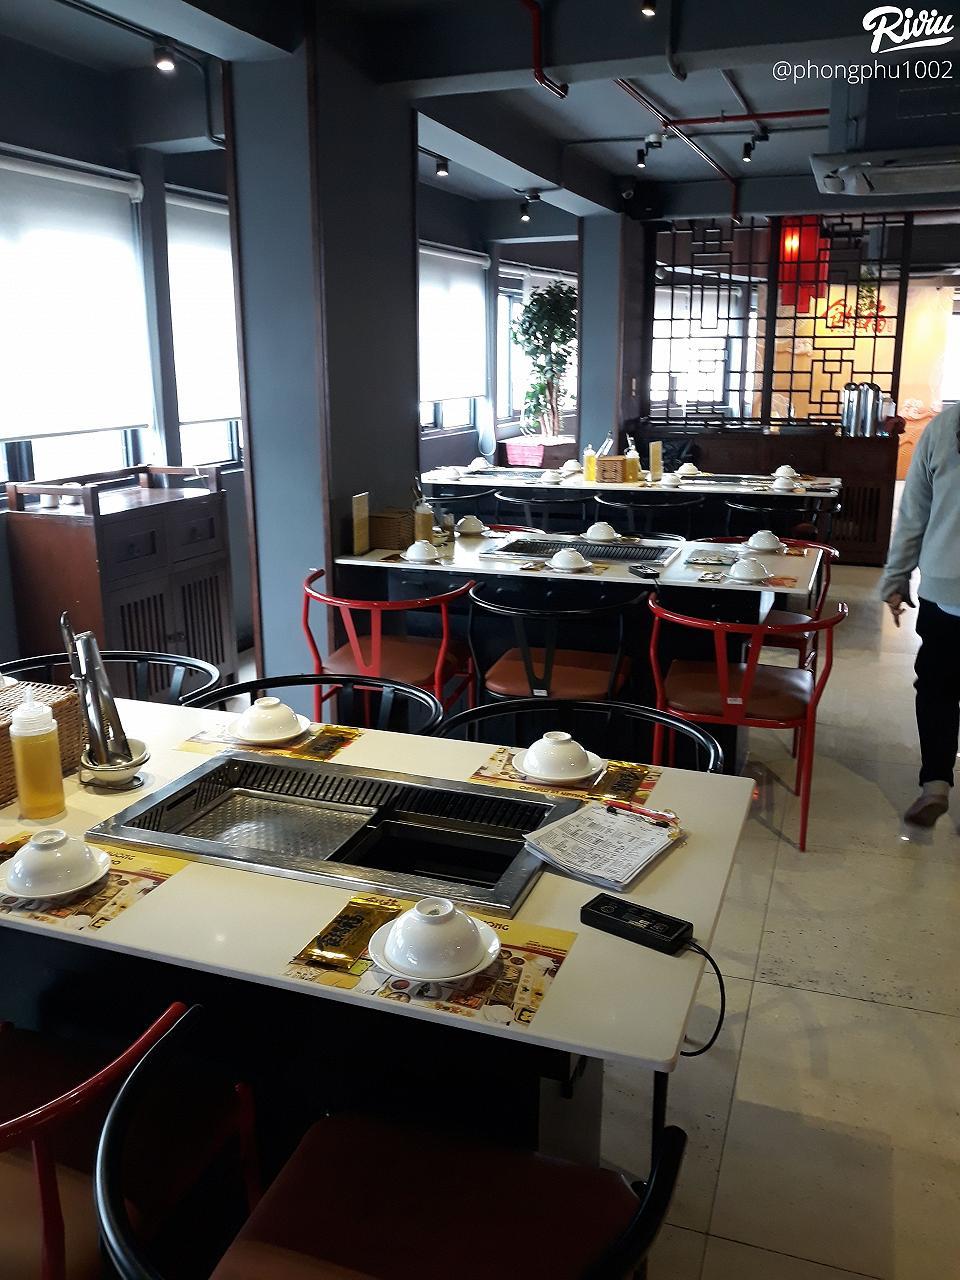 10* cho buffet lau nuong 180k sik dak food - anh 13